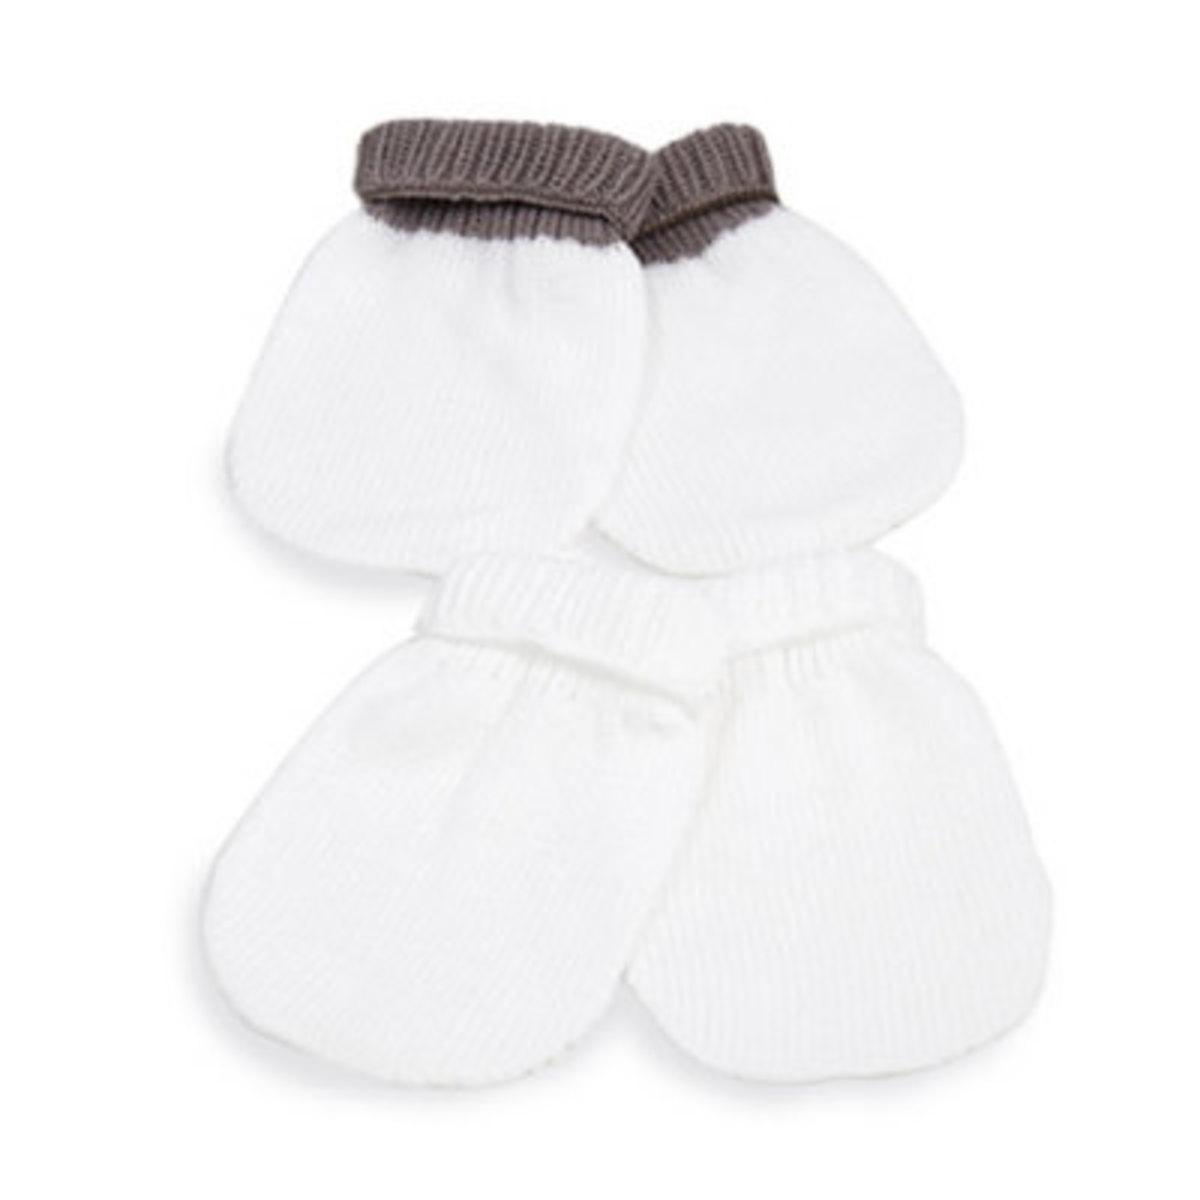 Organic KB1 Baby Mittens